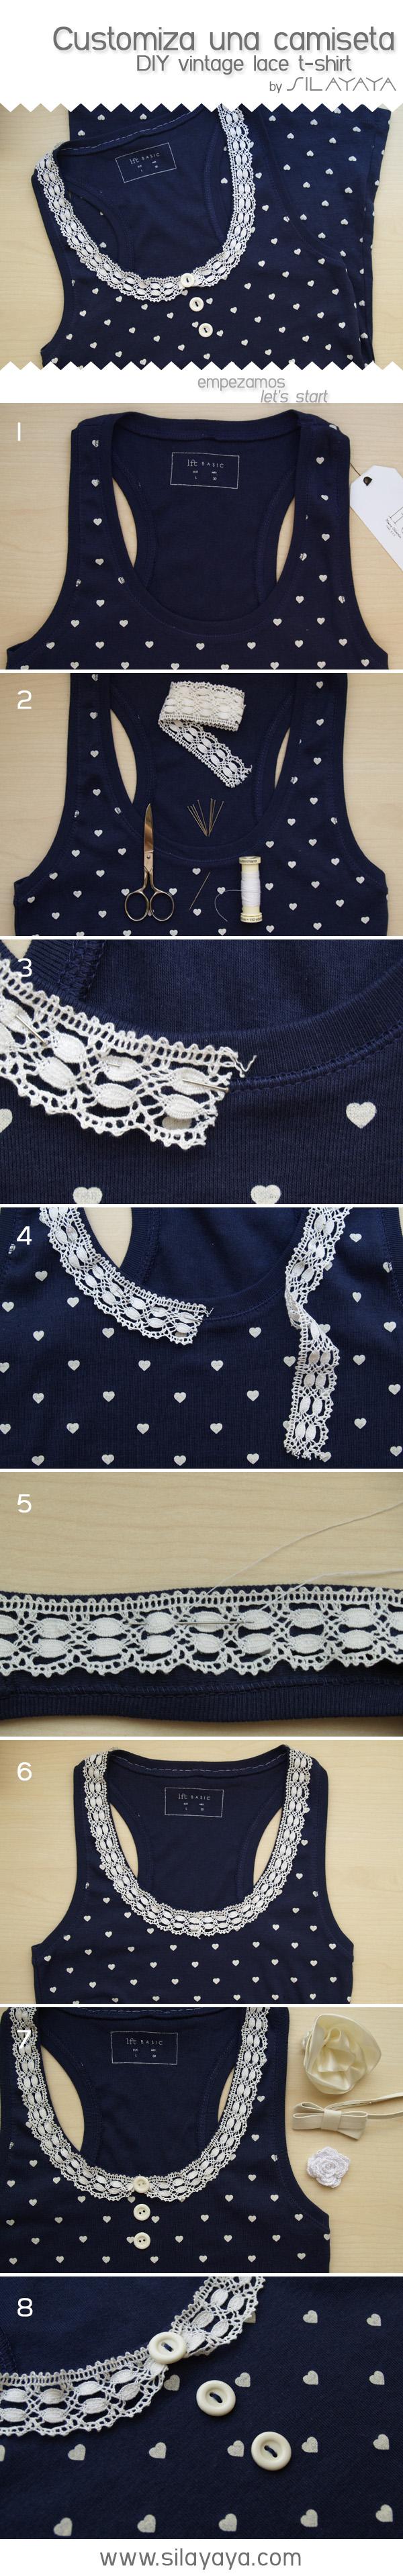 tutorial camiseta puntilla / DIY lace t-shirt